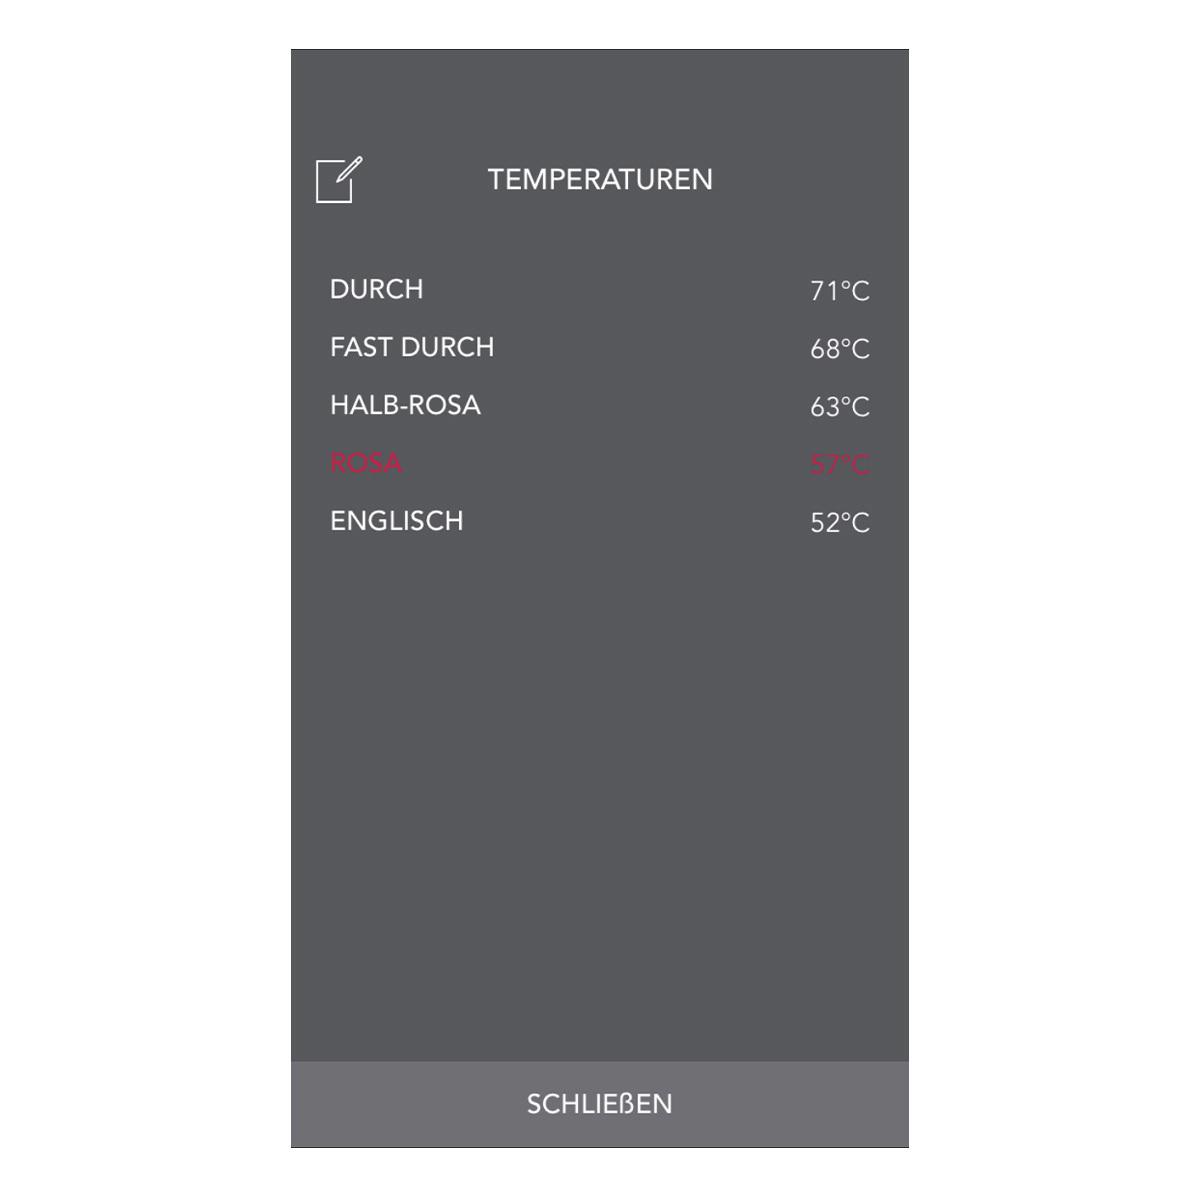 14-1505-01-gourmet-thermometer-für-smartphones-thermowire-app-anwendung3-1200x1200px.jpg